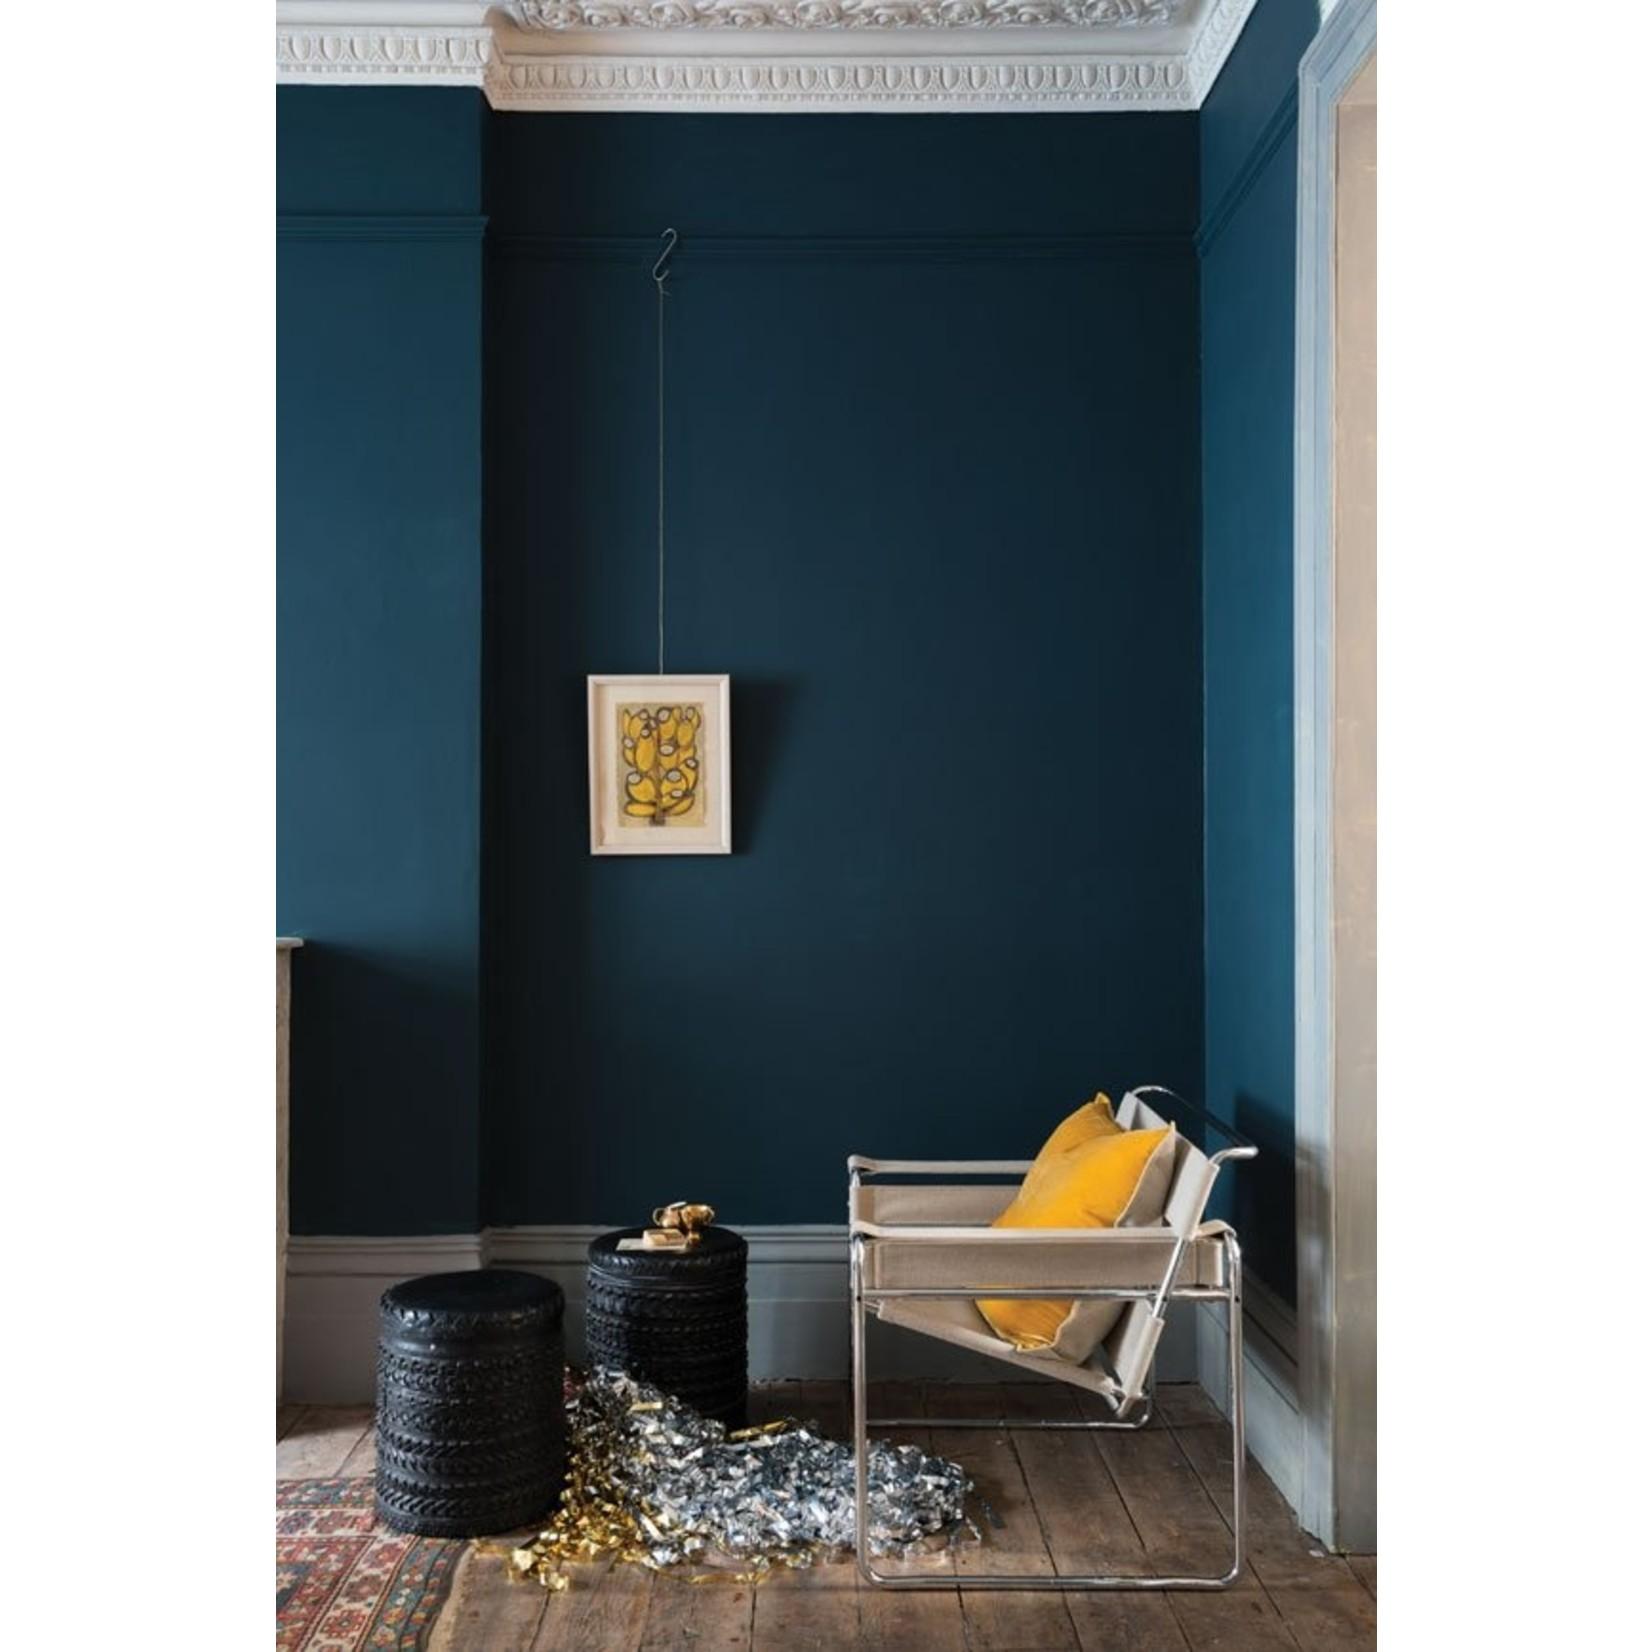 FARROW & BALL HAGUE BLUE - No. 30